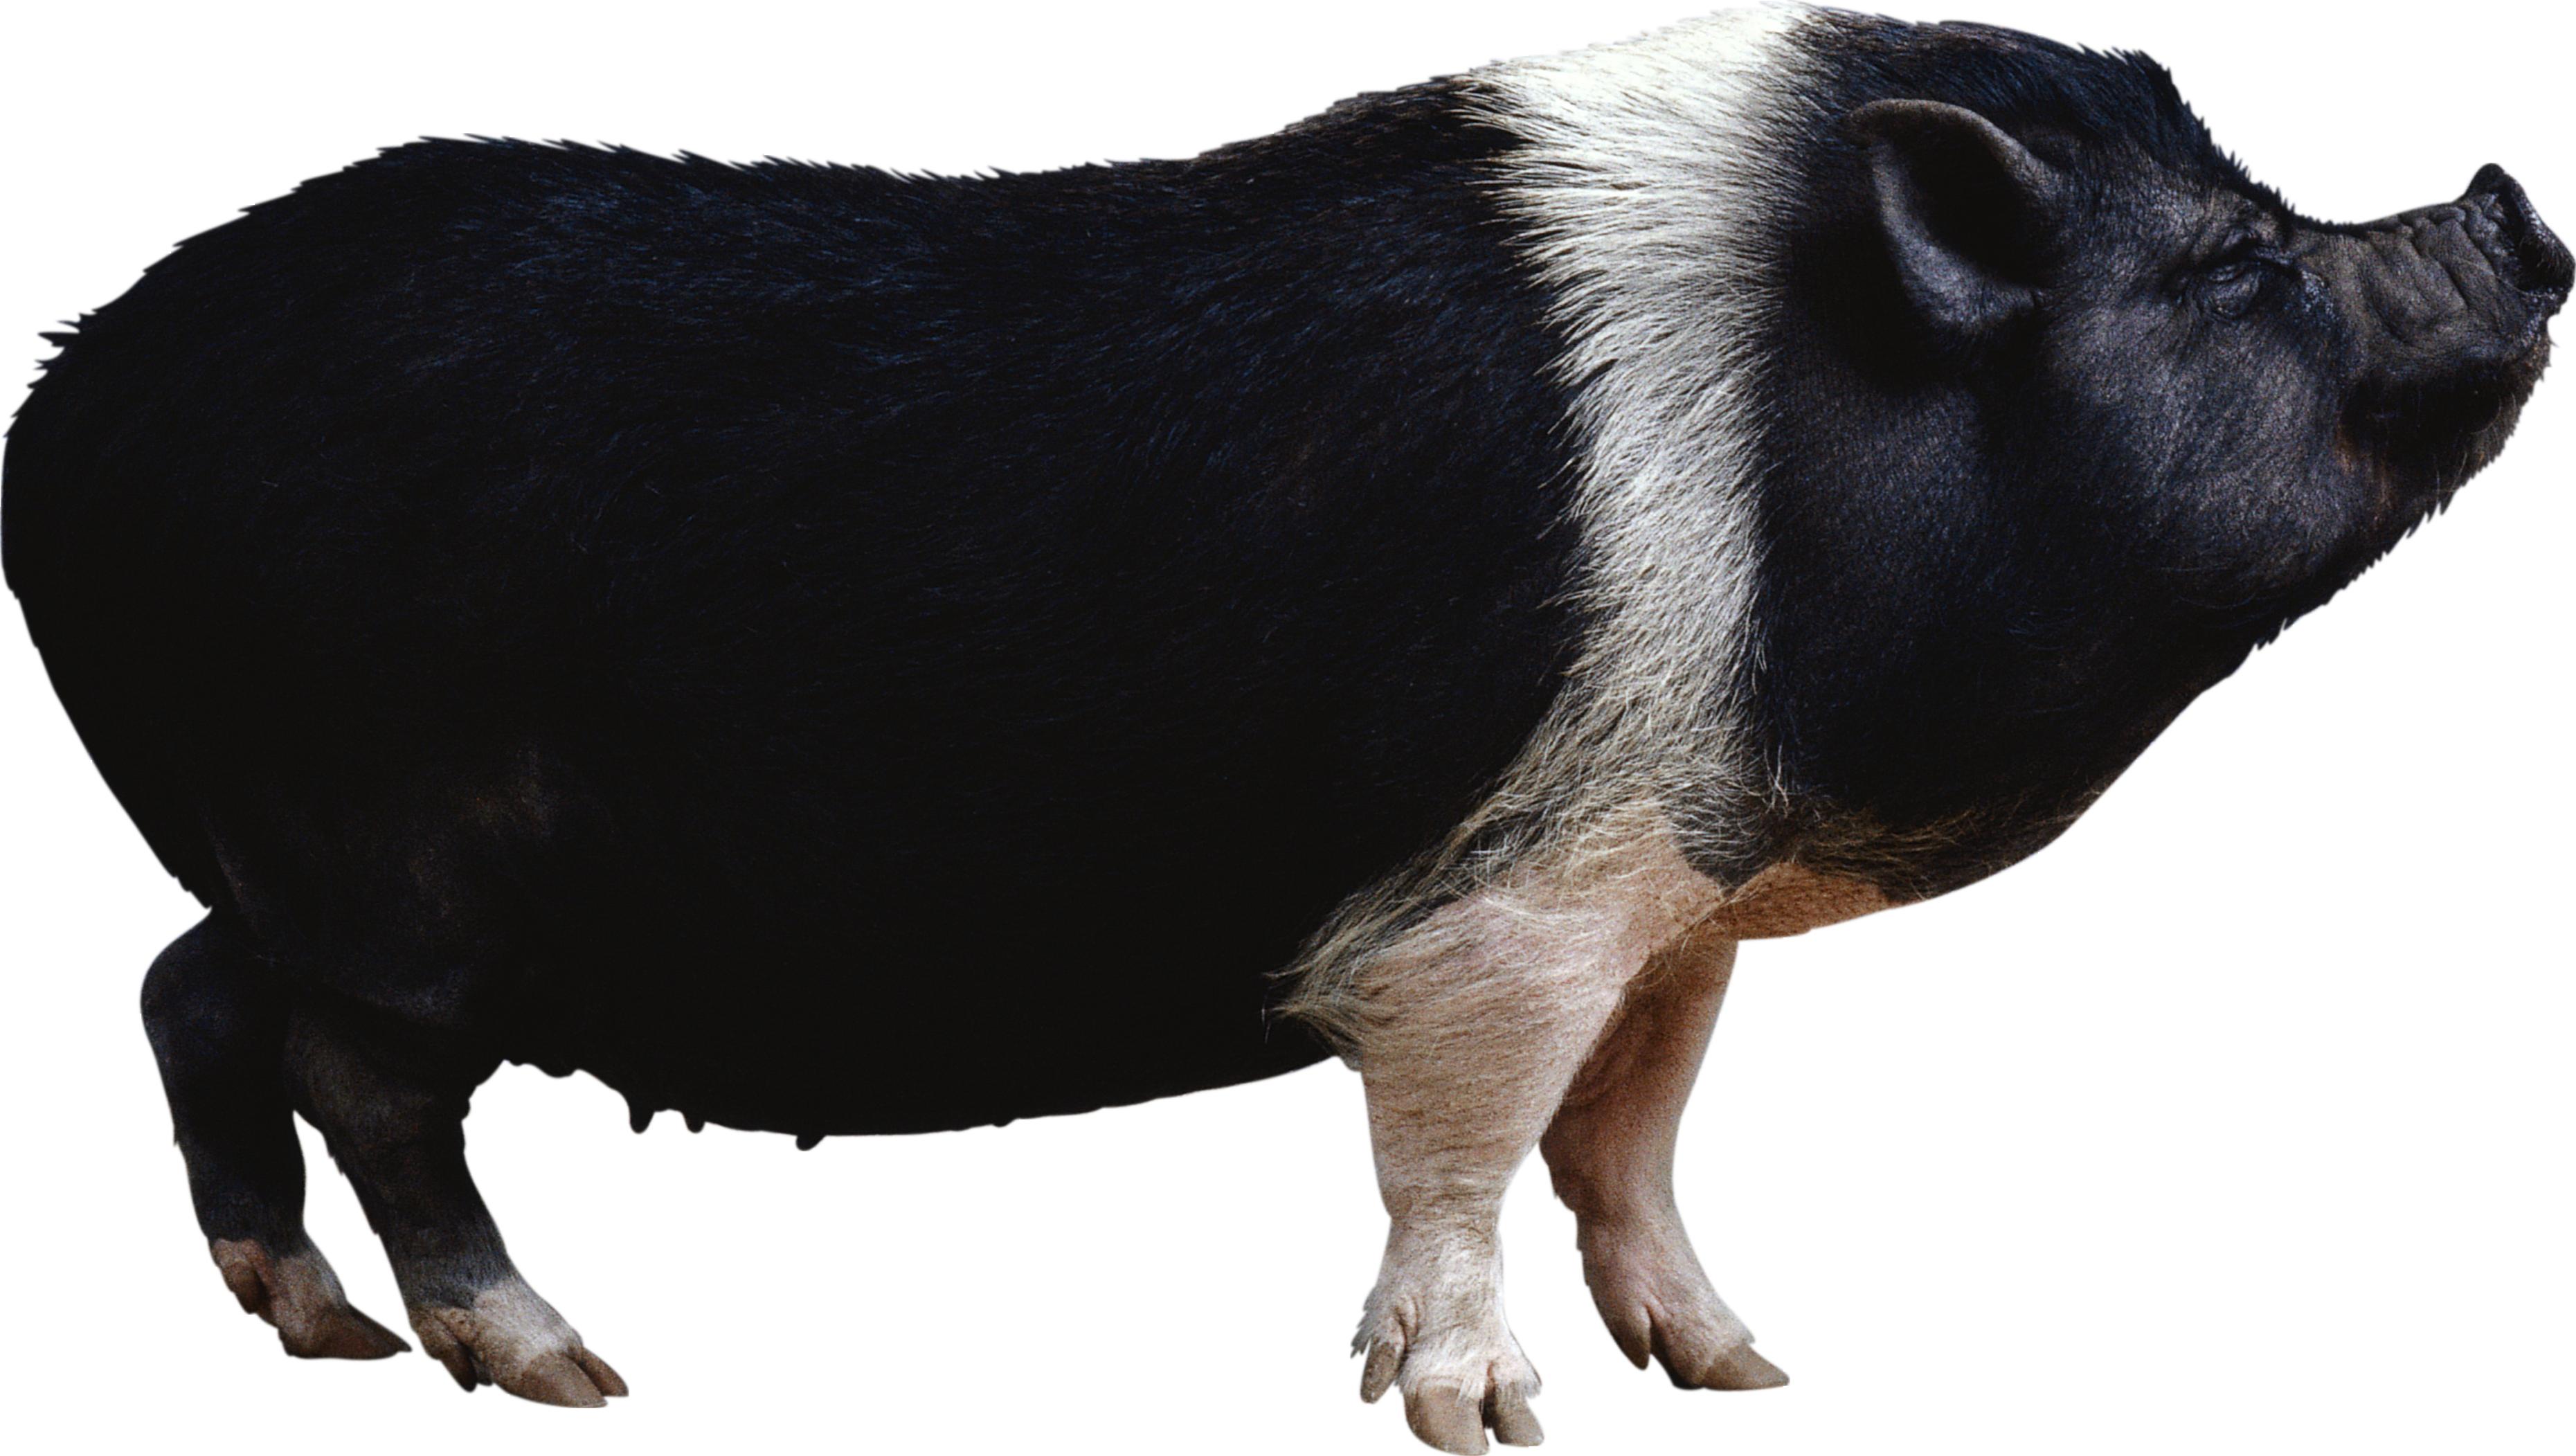 Black Pig Clipart.